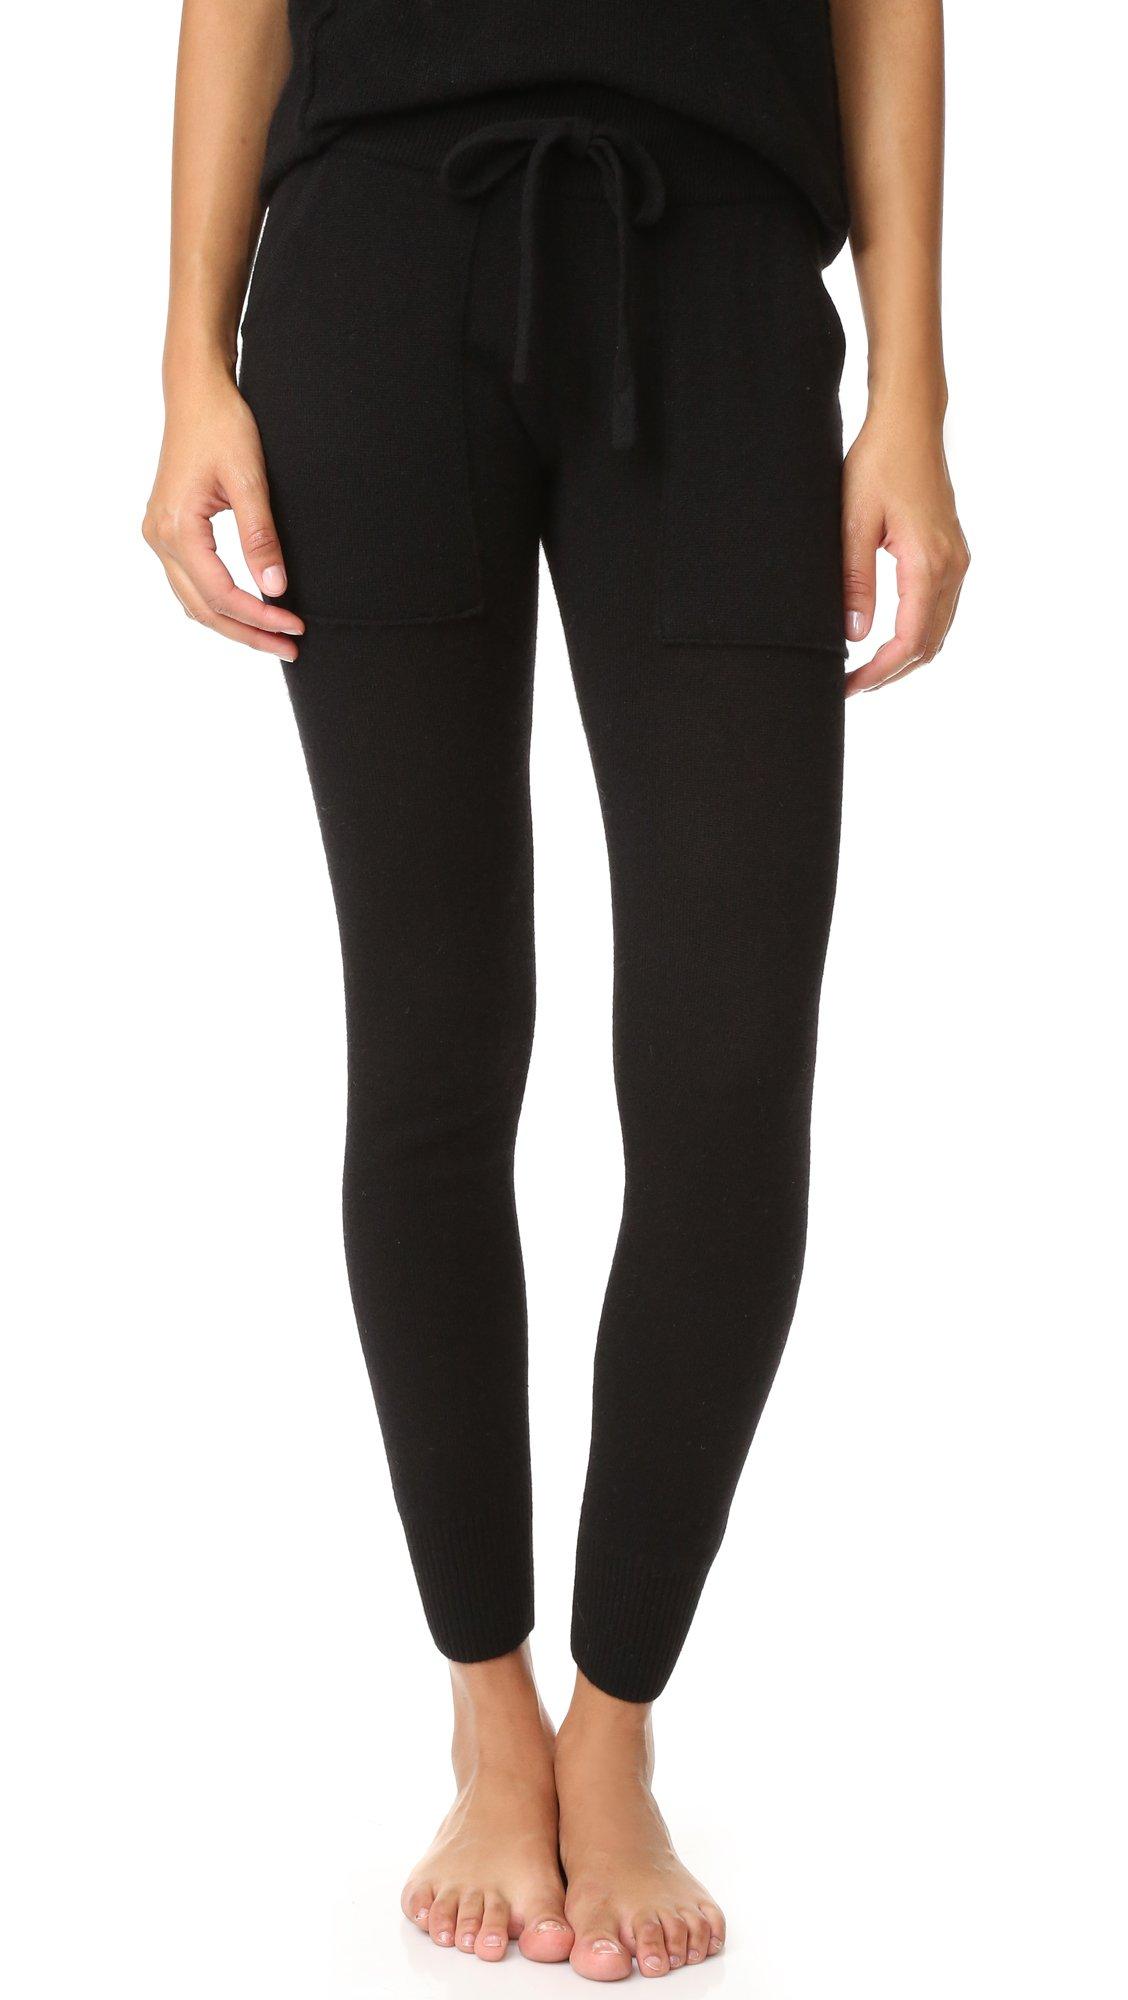 White + Warren Women's Essential Cashmere Pants, Black, Medium